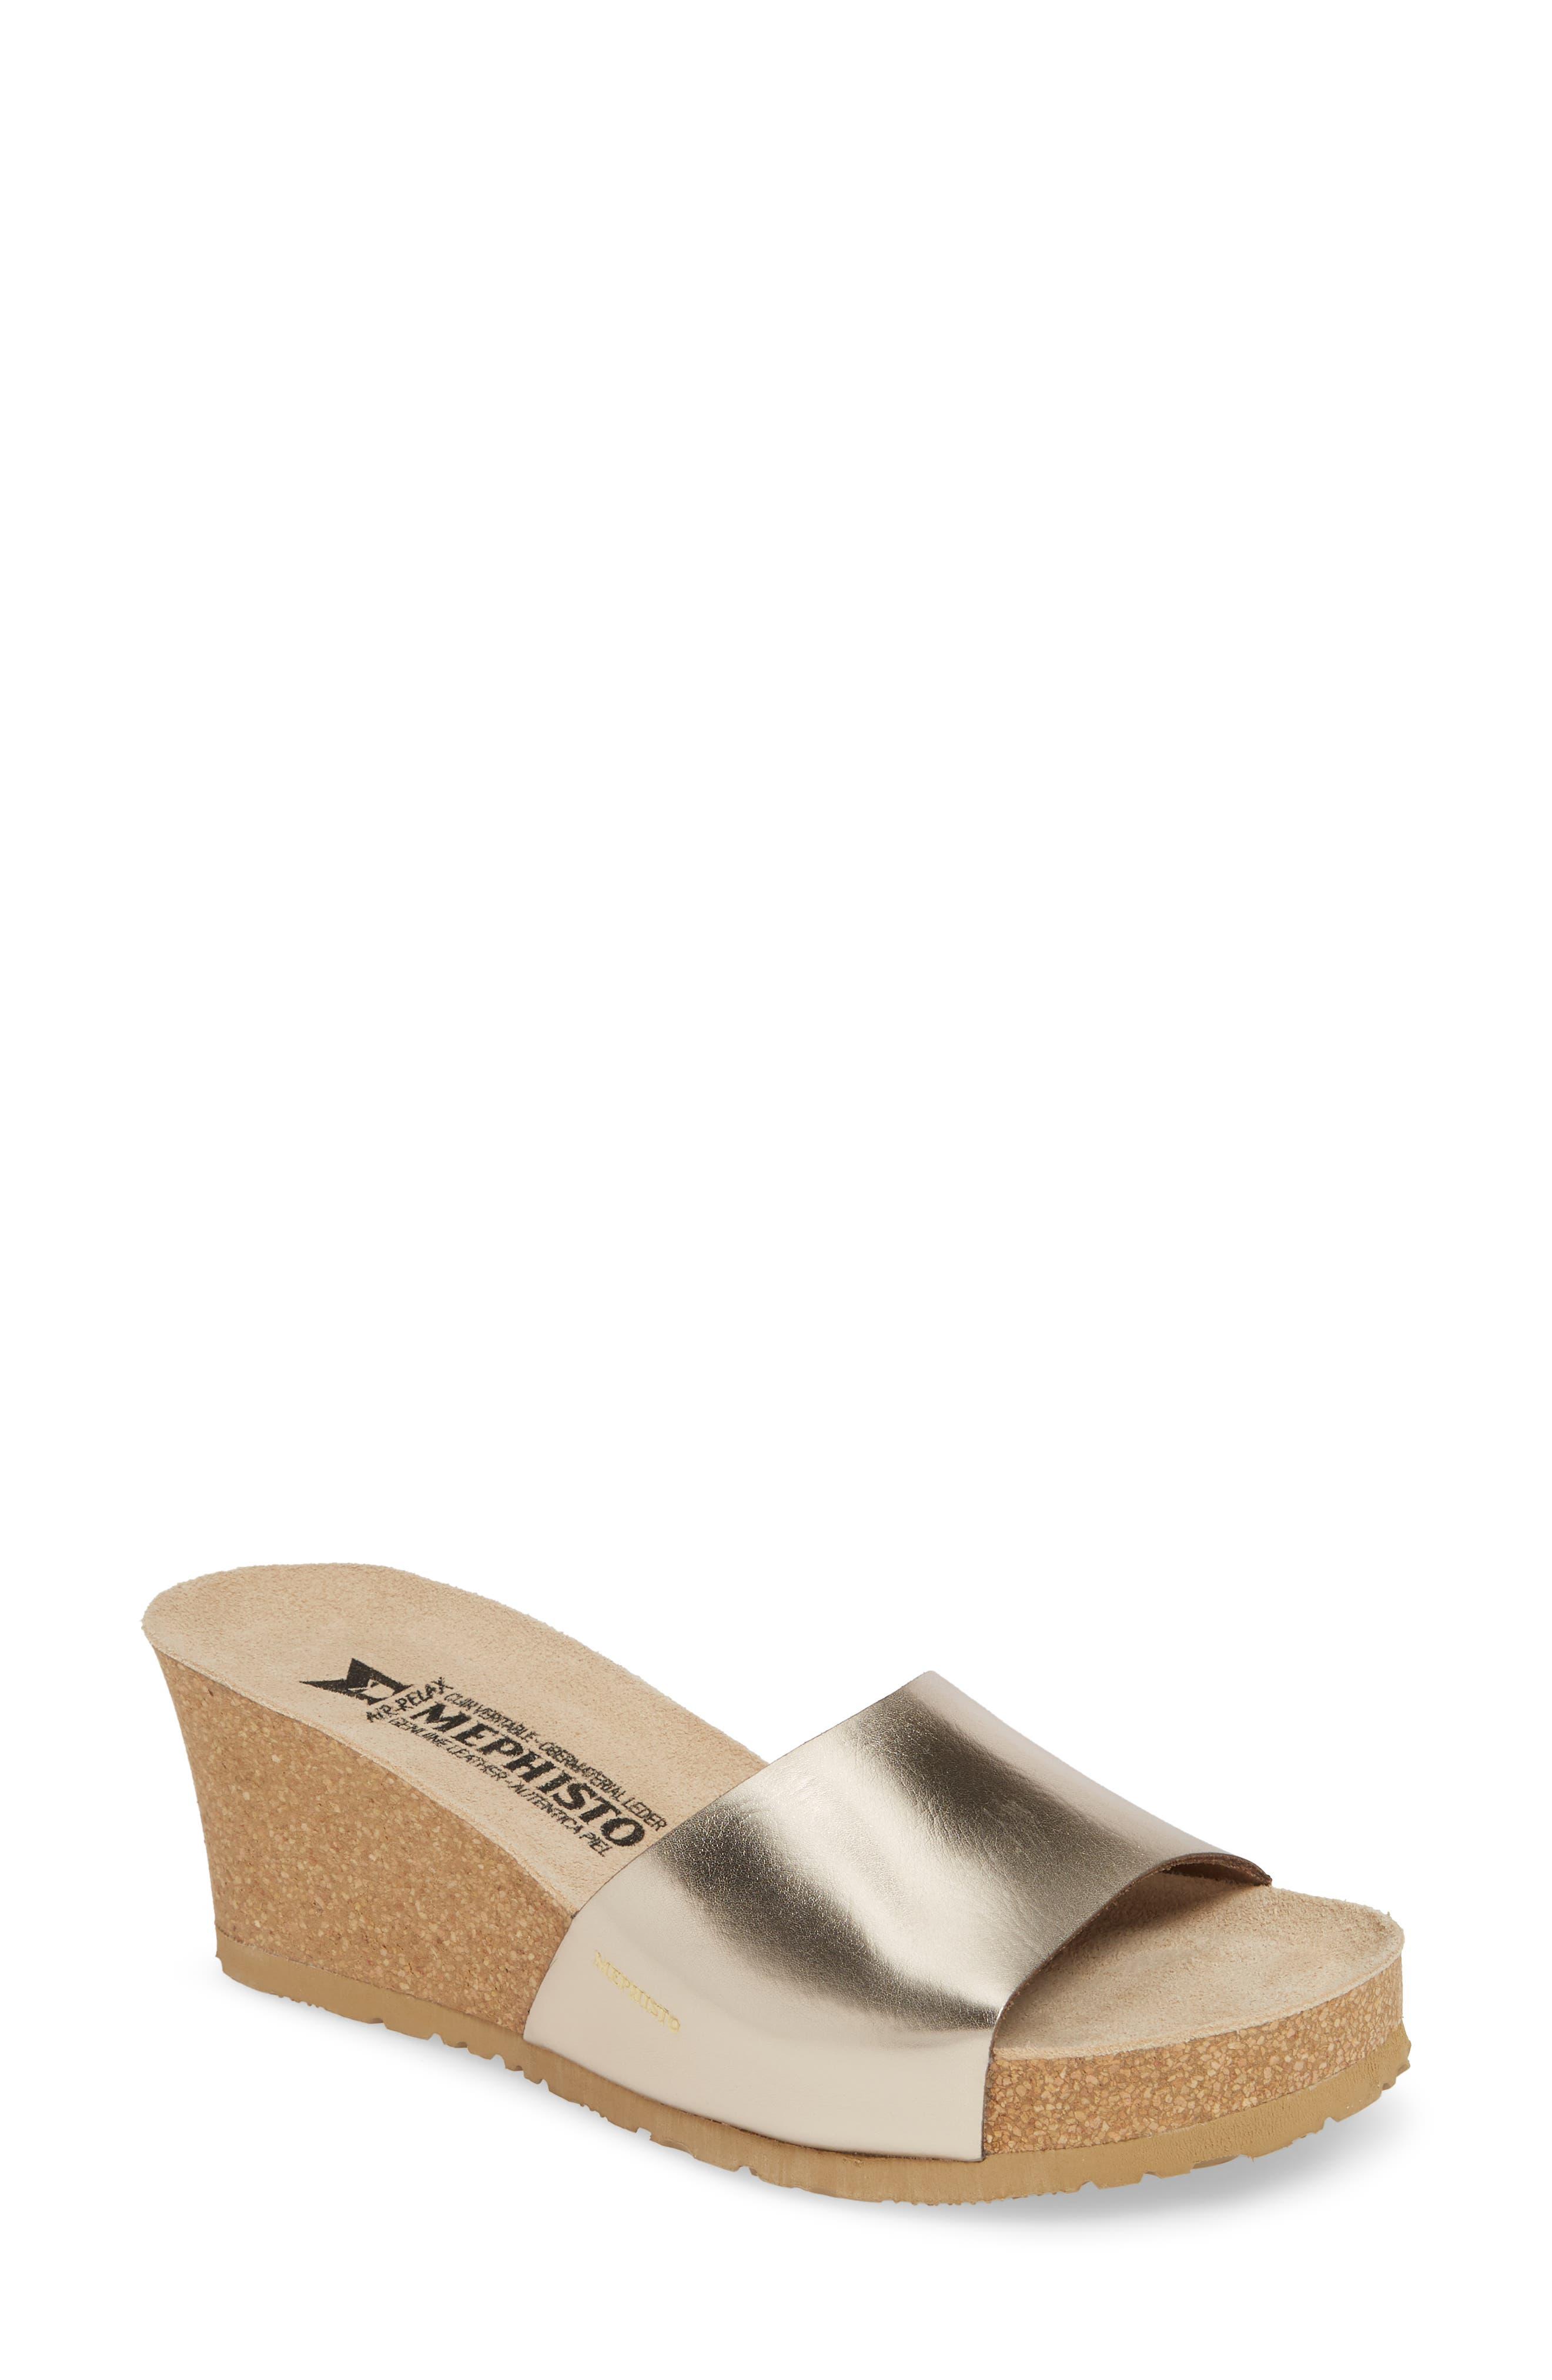 MEPHISTO, Lise Platform Wedge Sandal, Main thumbnail 1, color, PLATINUM LEATHER